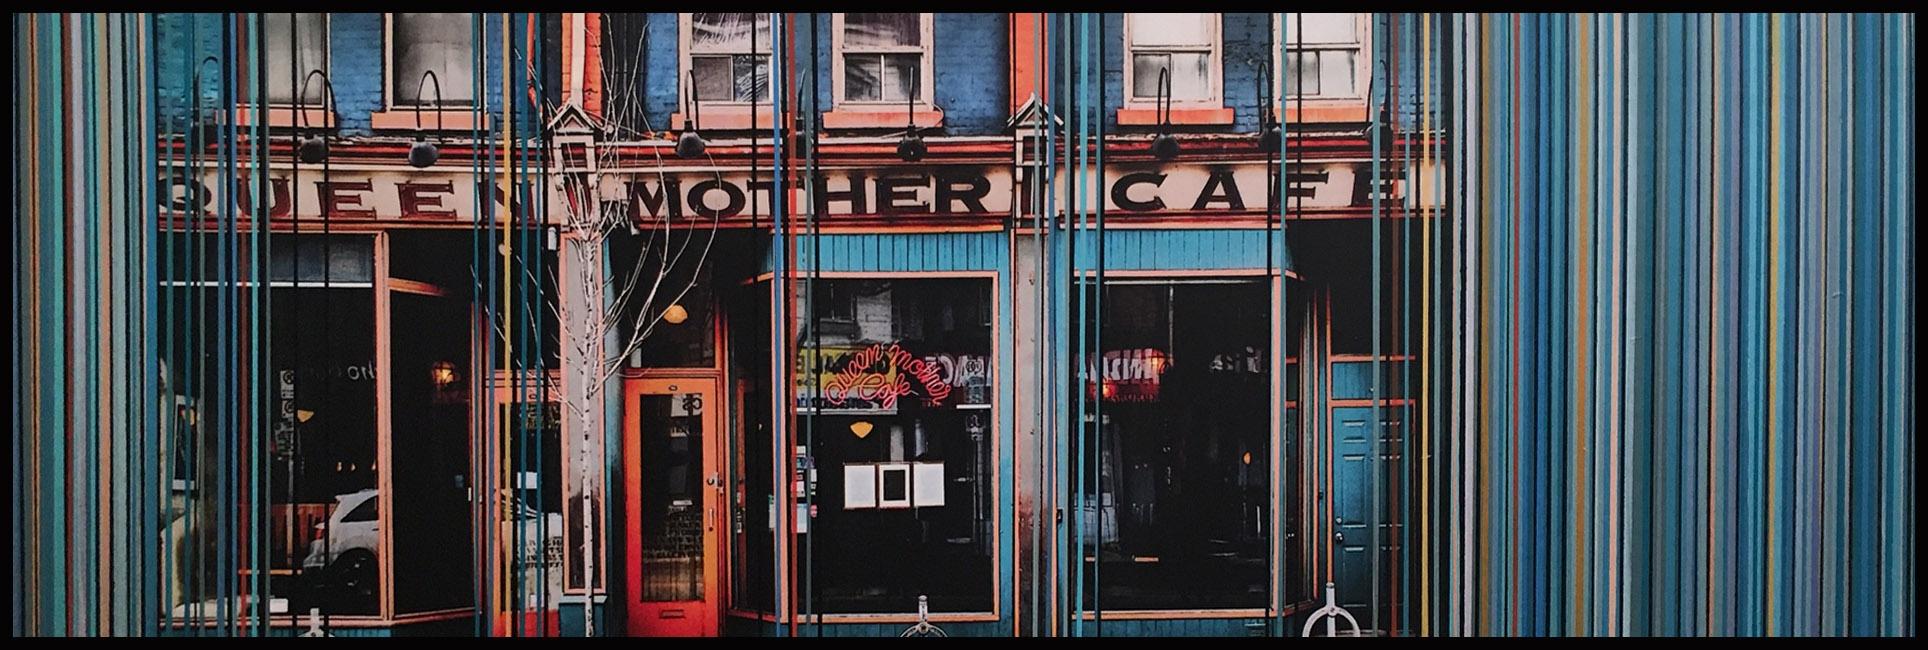 Queen Cafe  by Jamie MacRae